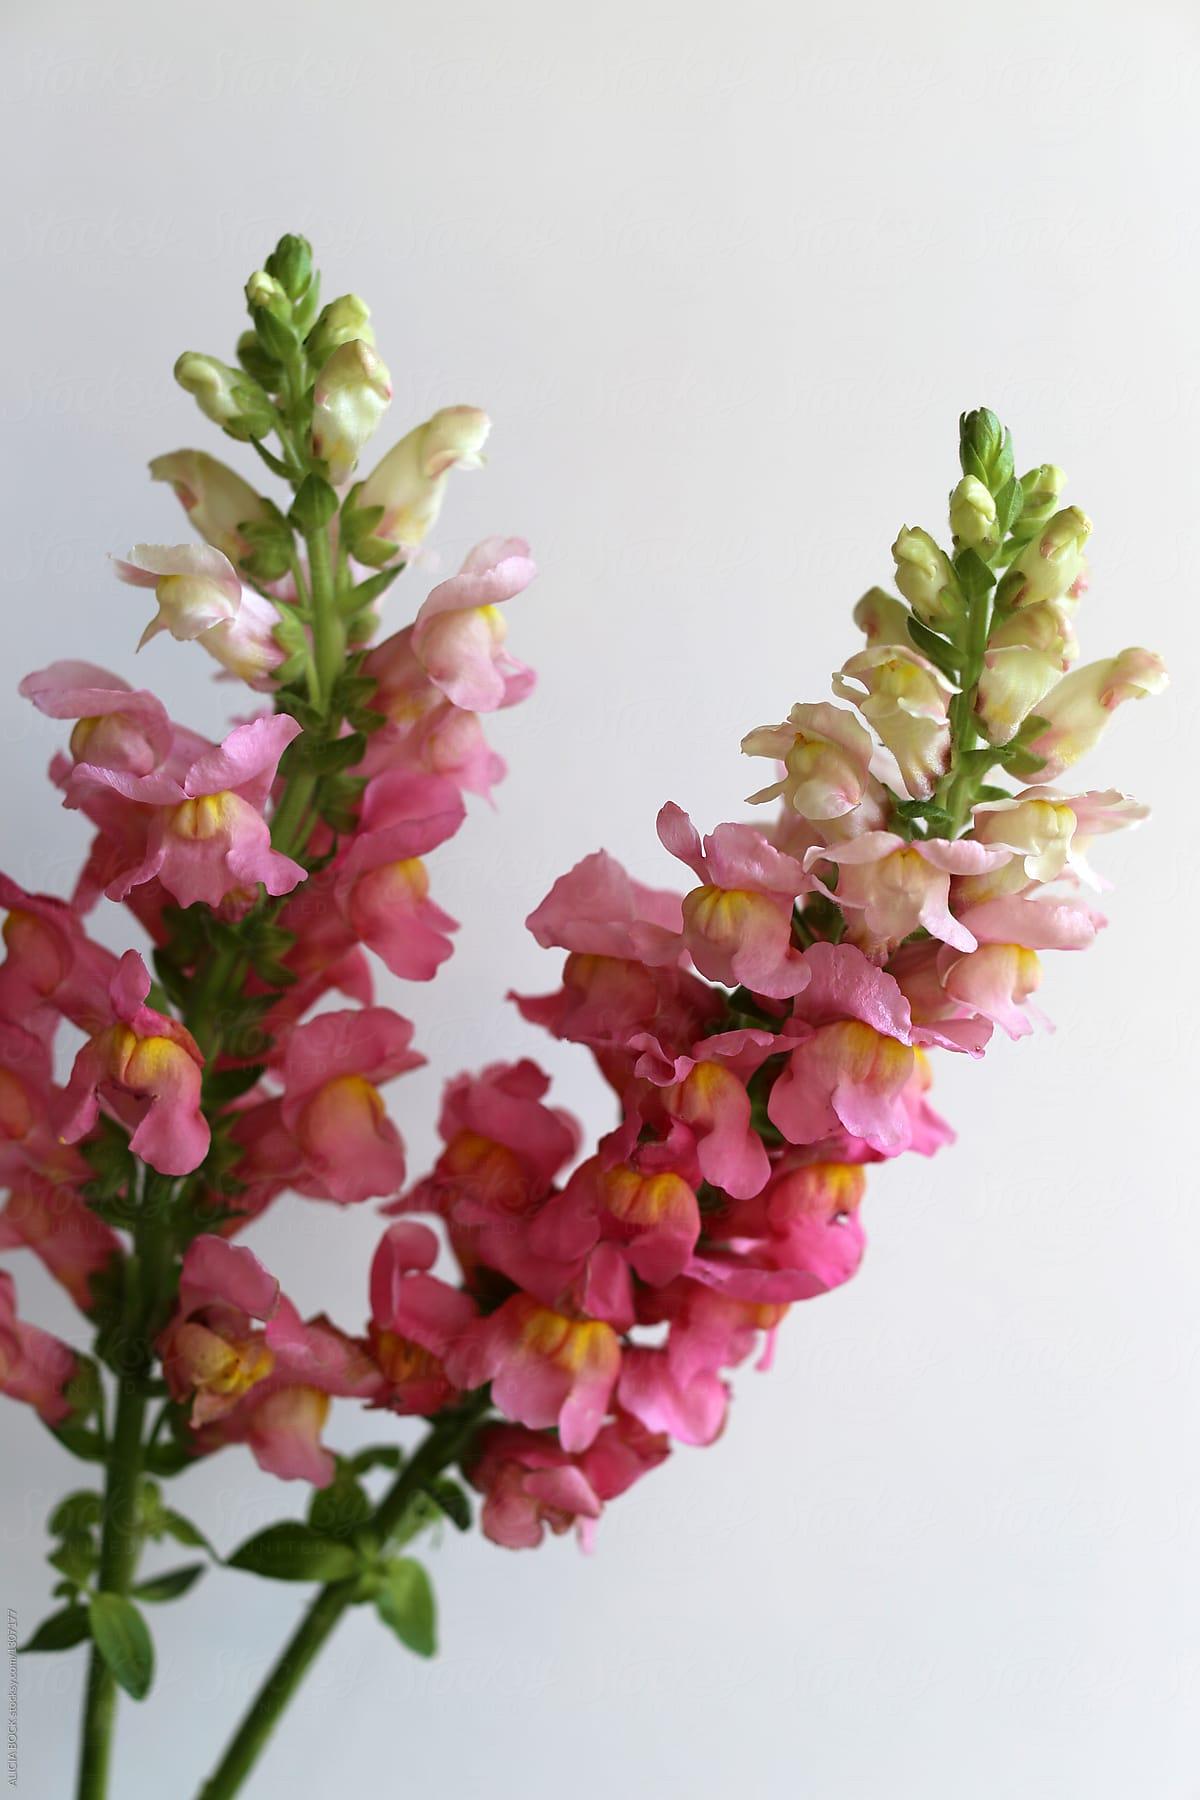 Two Pink Snapdragon Flowers In Full Bloom Stocksy United